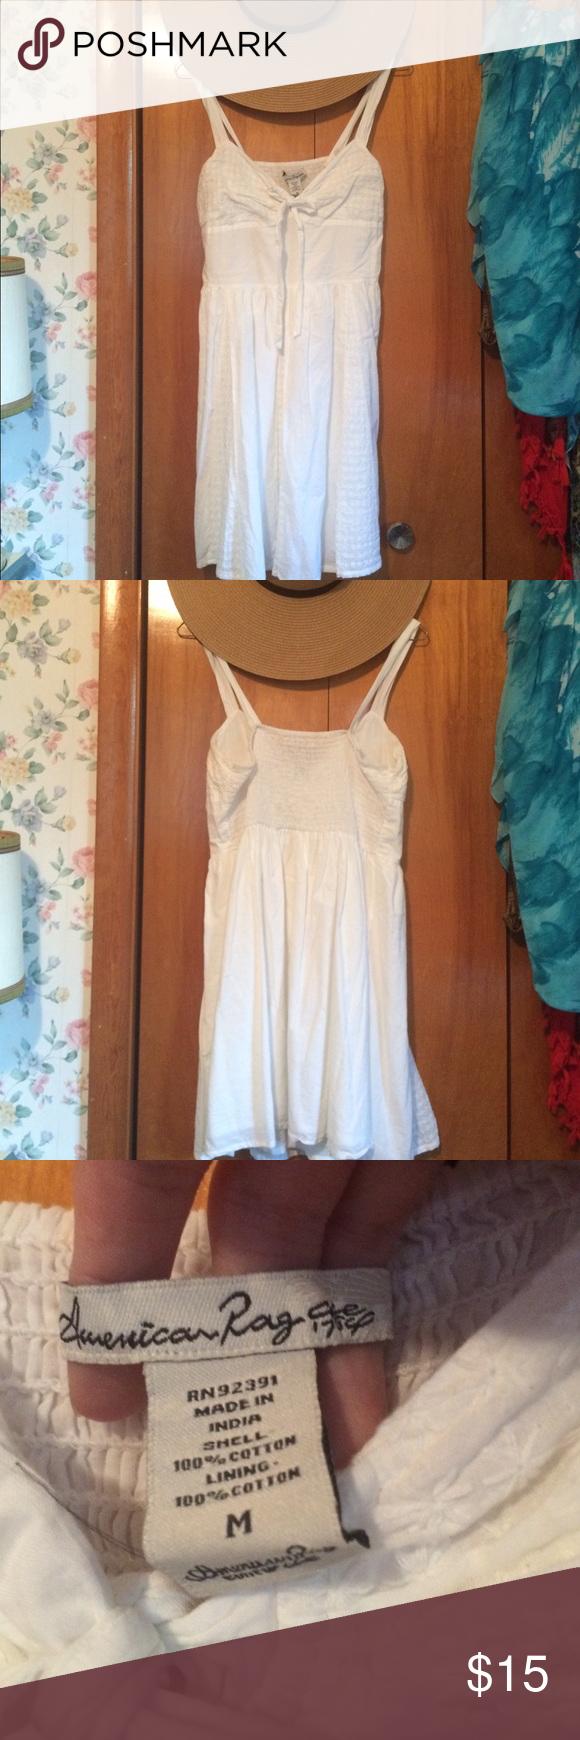 White Cotton Dress Pinterest American Rag Flower Patterns And